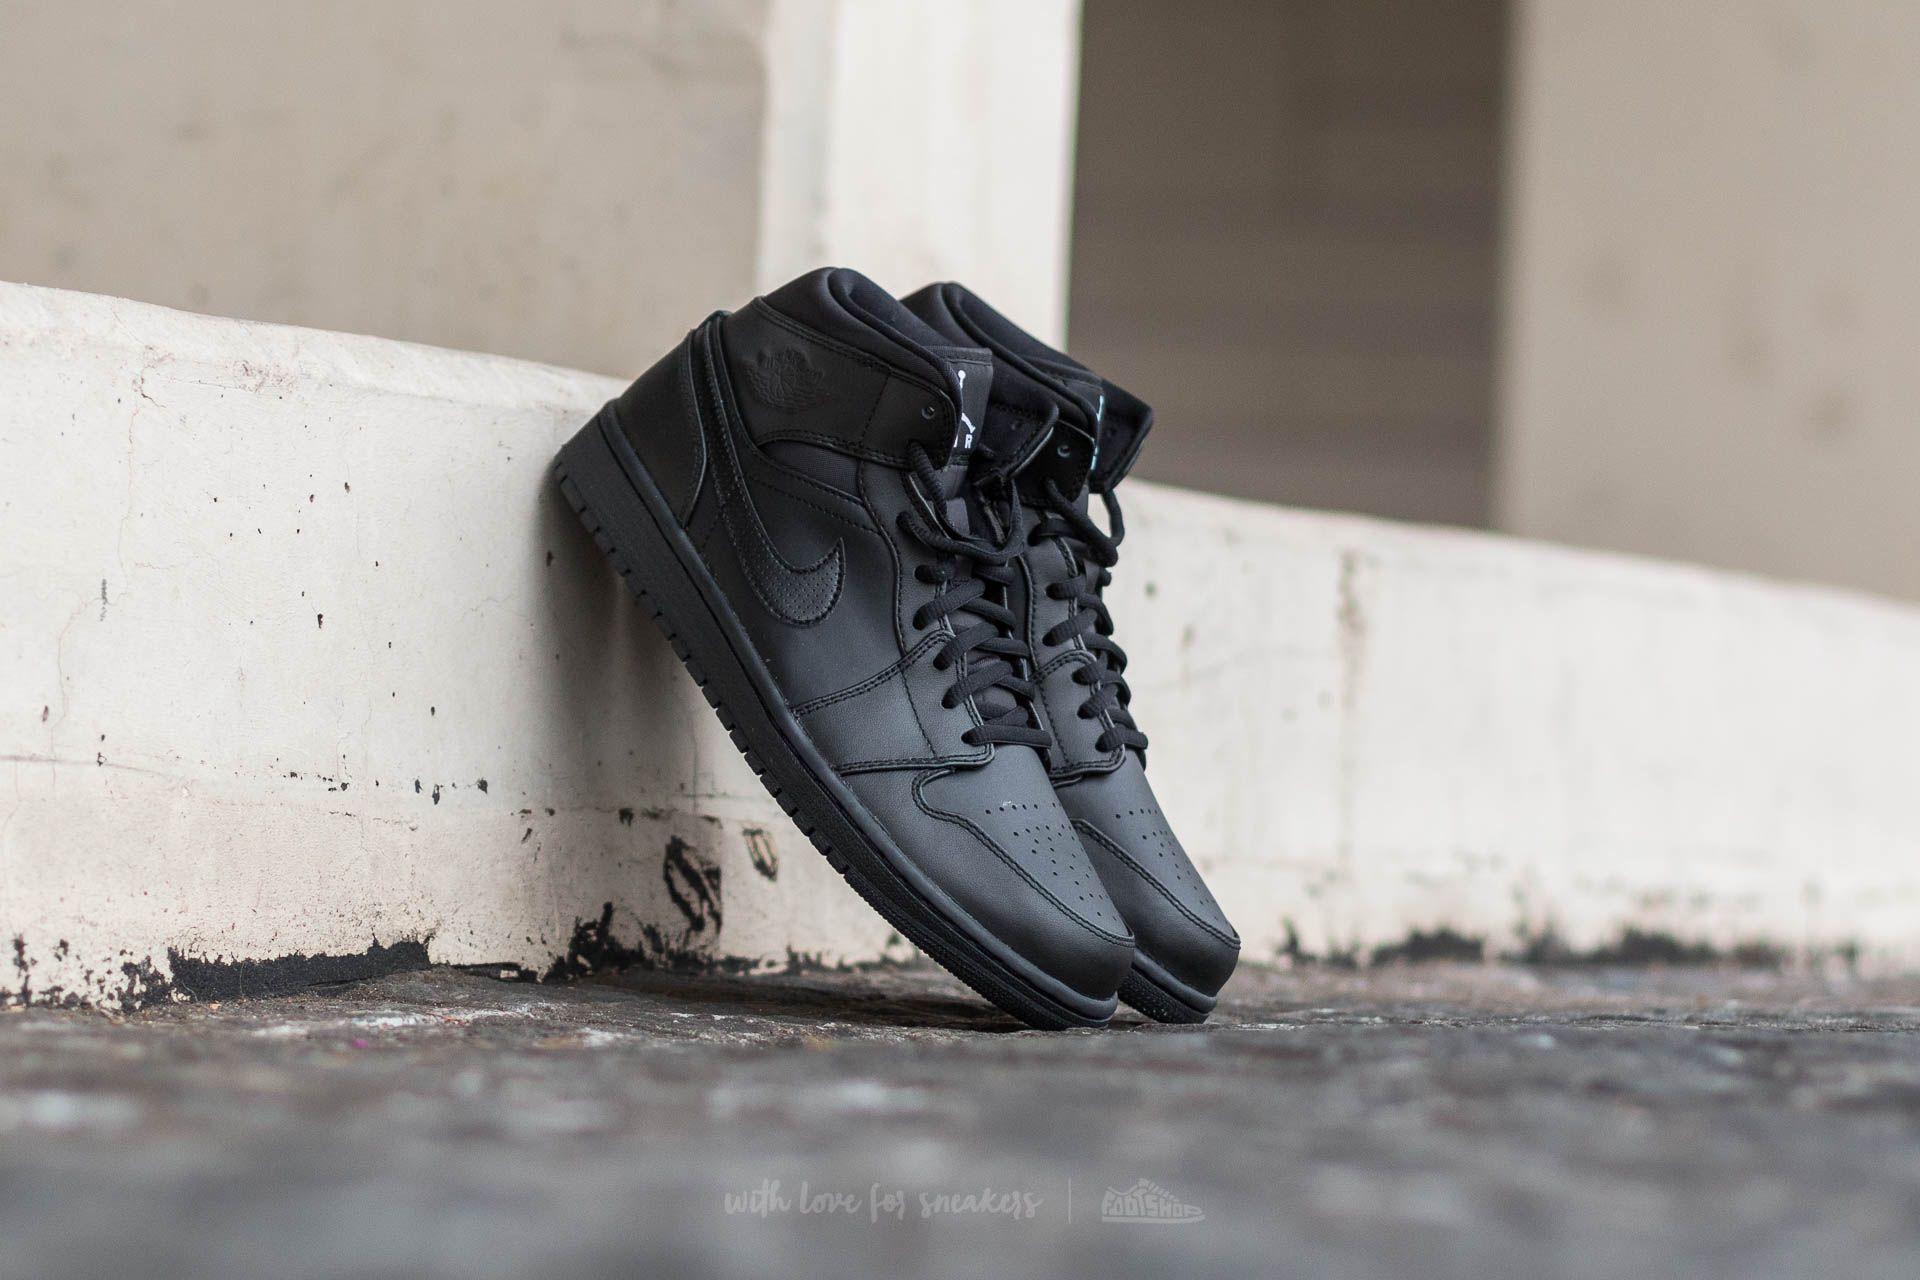 e9b5dbec415f6 Air Jordan 1 MID Black   White